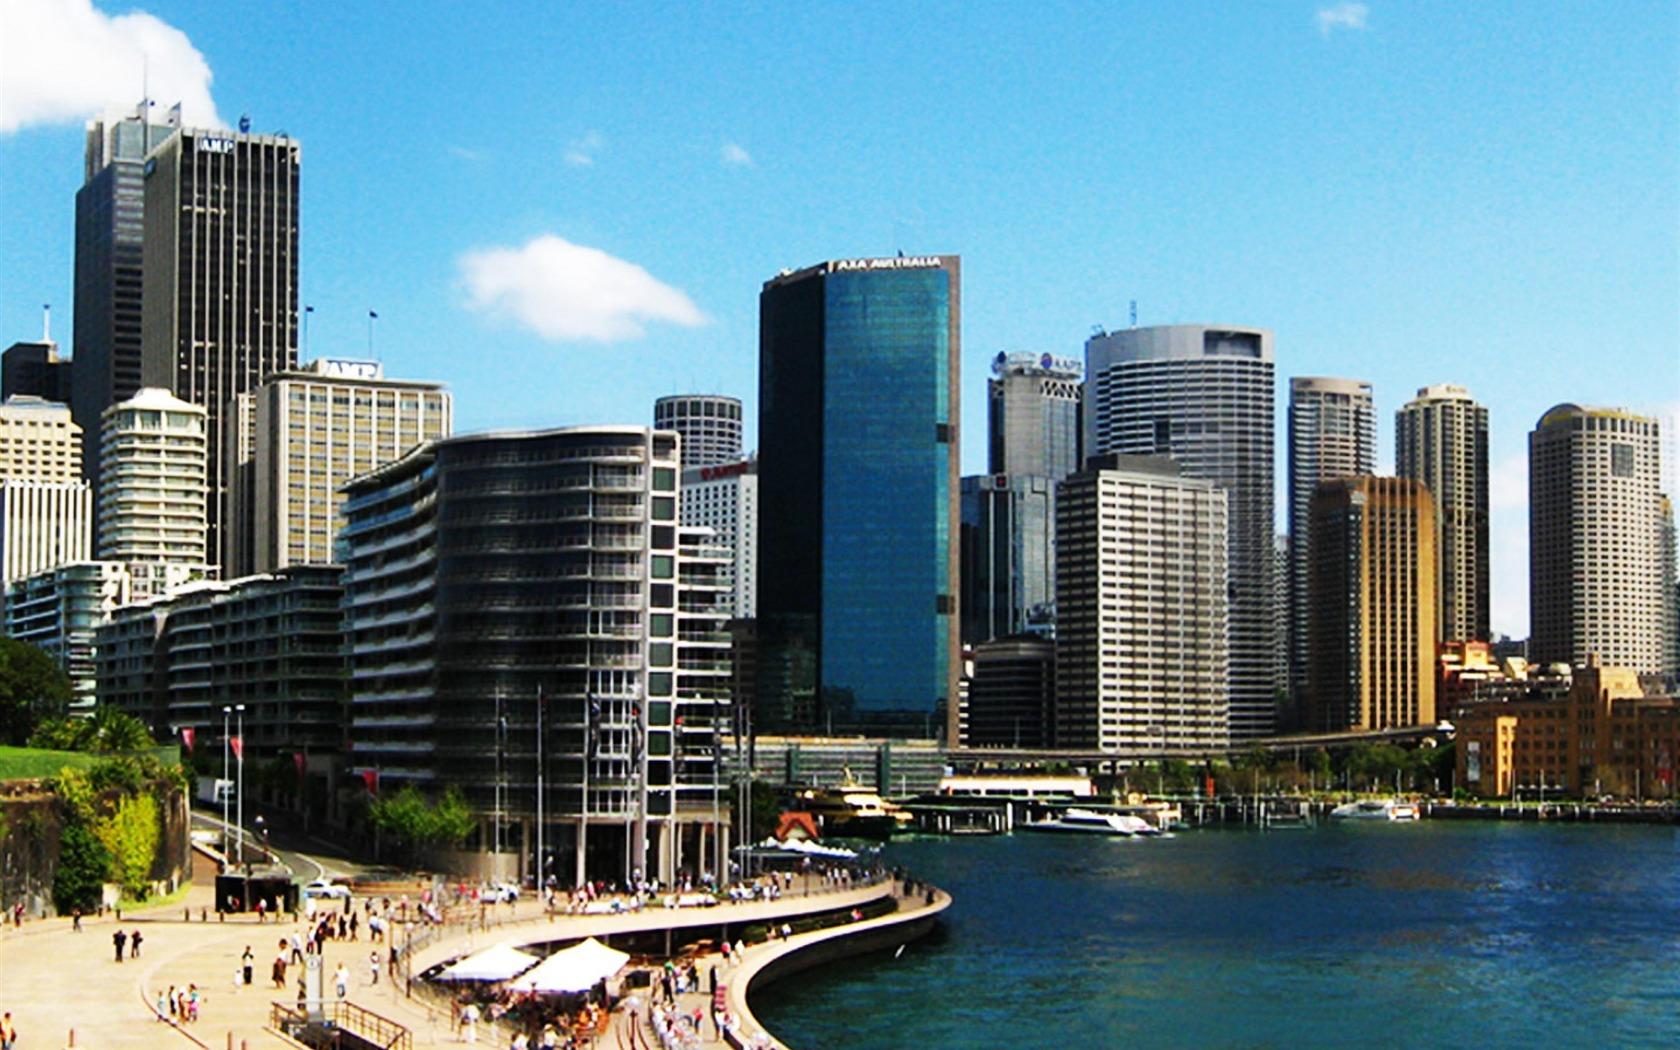 Sydney Modern Australian City Graphy Wallpaper 1680x1050 pixel City 1680x1050